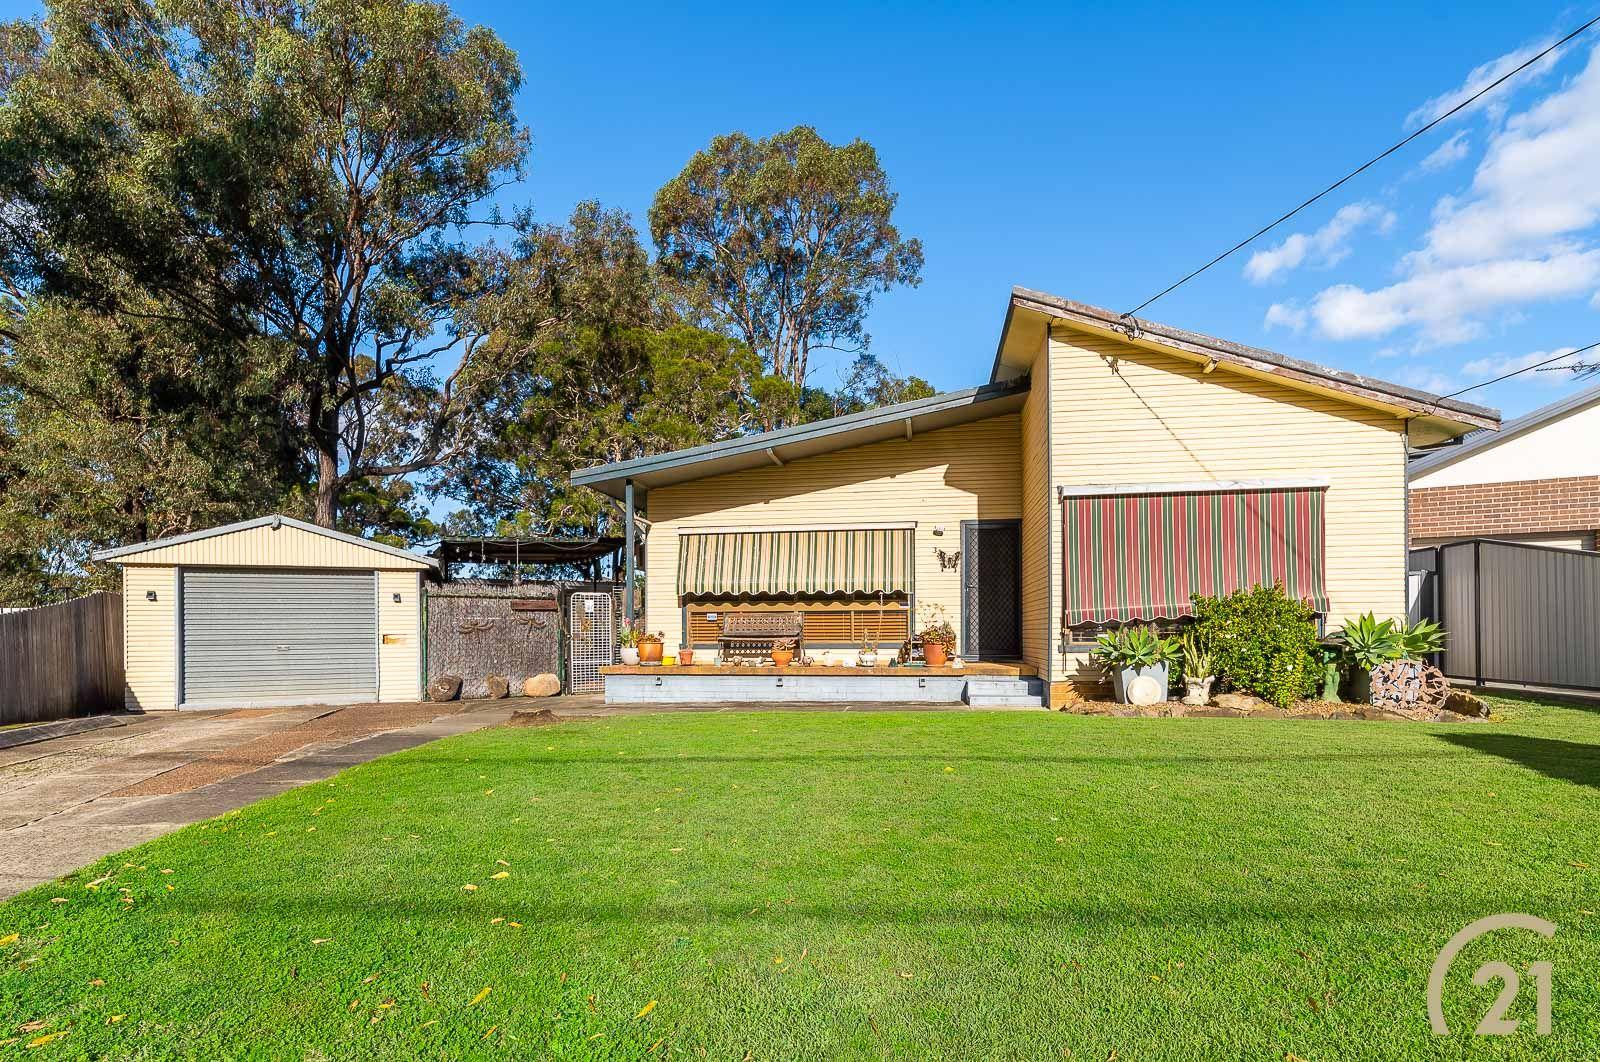 31 Karoon Avenue, Canley Heights NSW 2166, Image 0